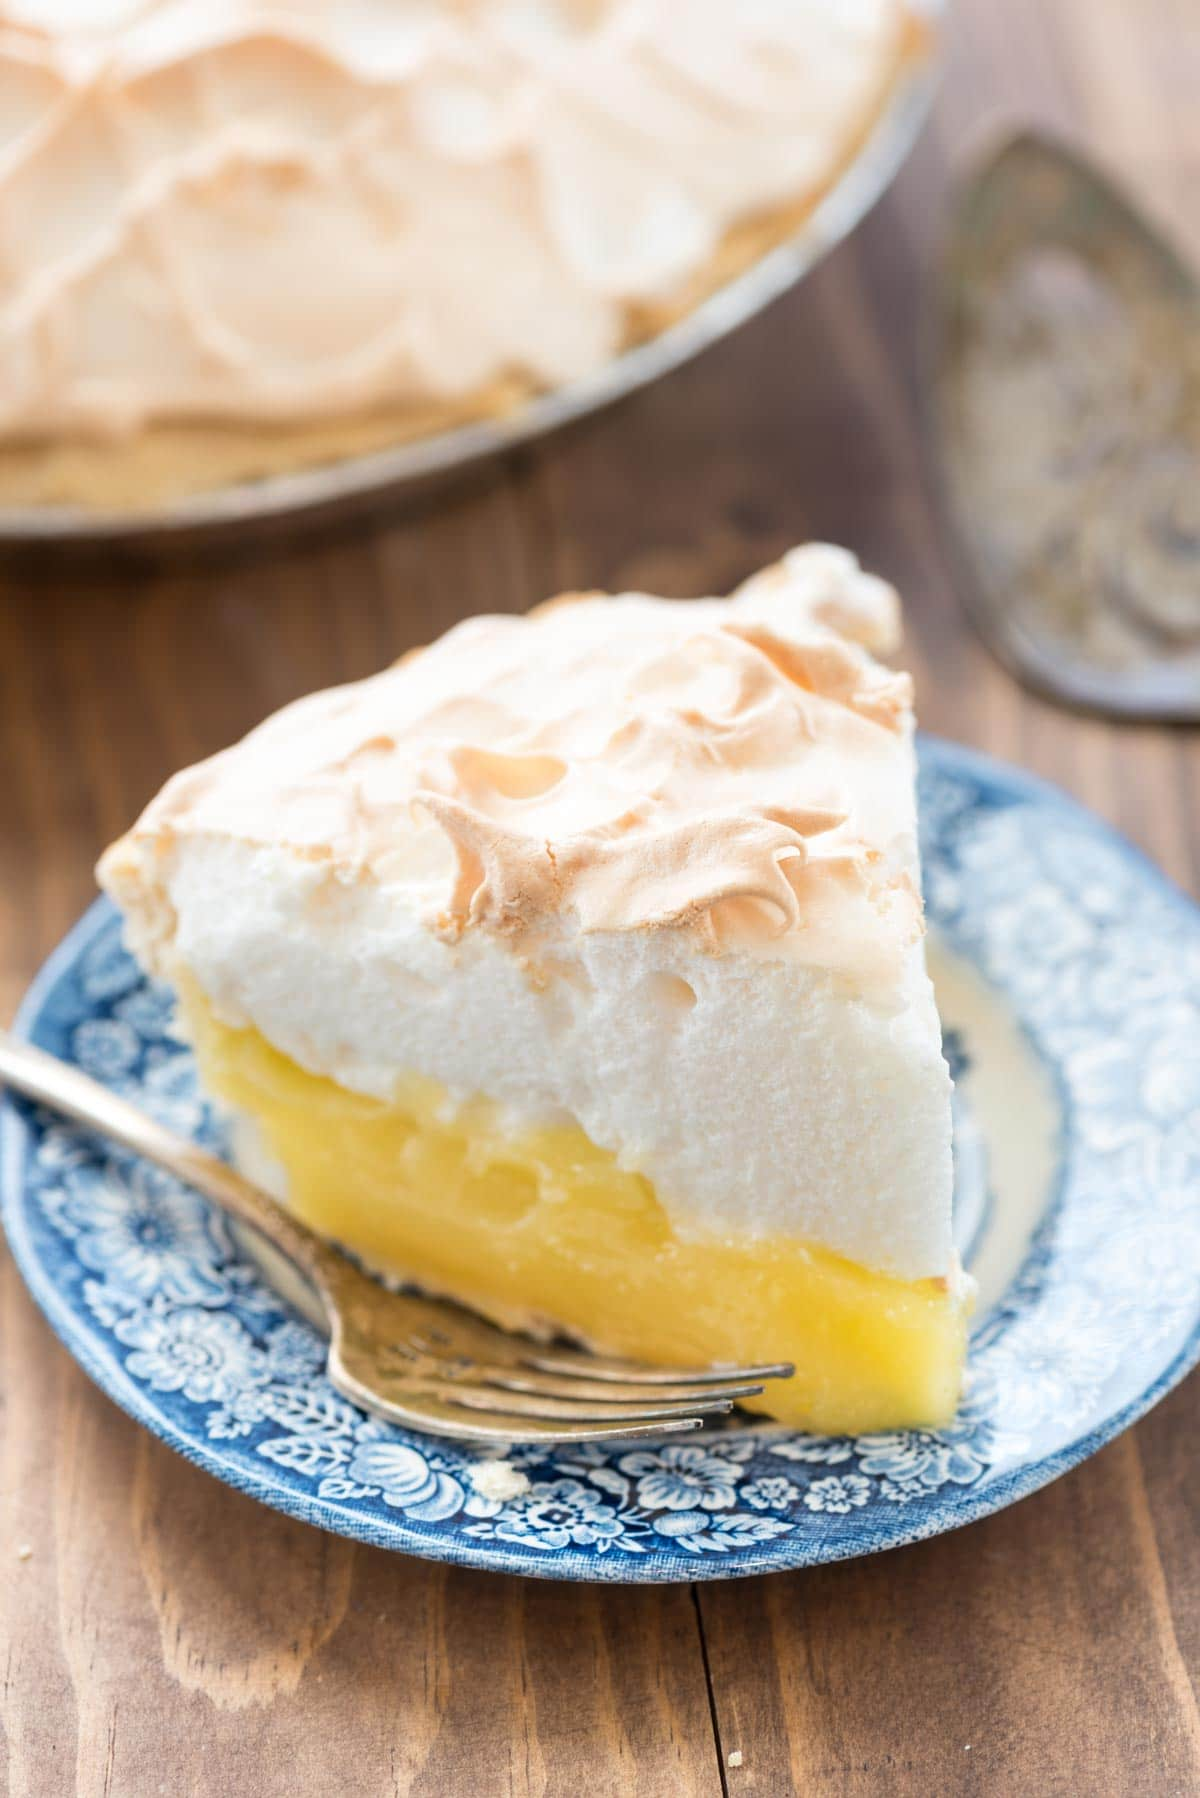 Aunt Tootsie's Lemon Meringue Pie - Crazy for Crust